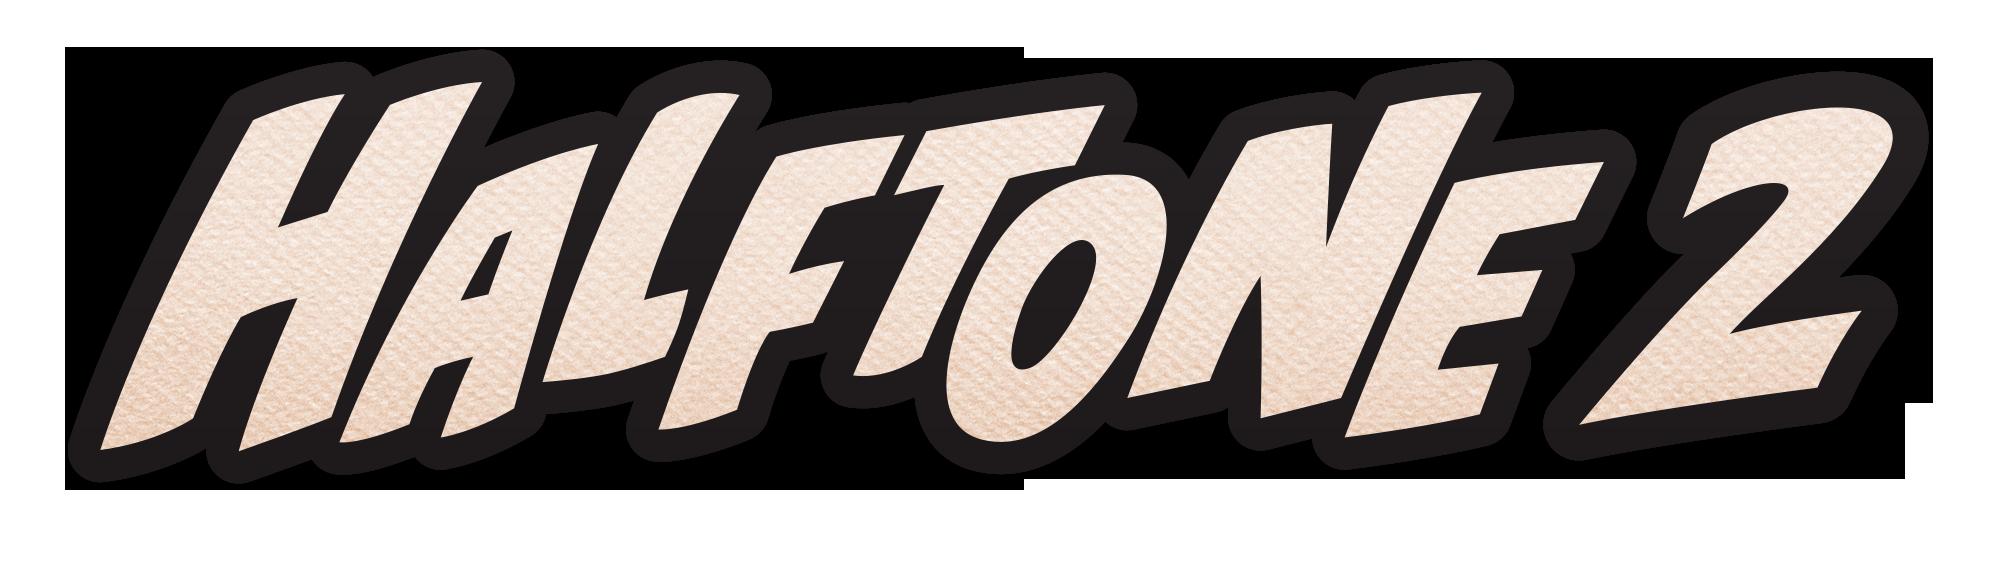 Halftone 2 Title